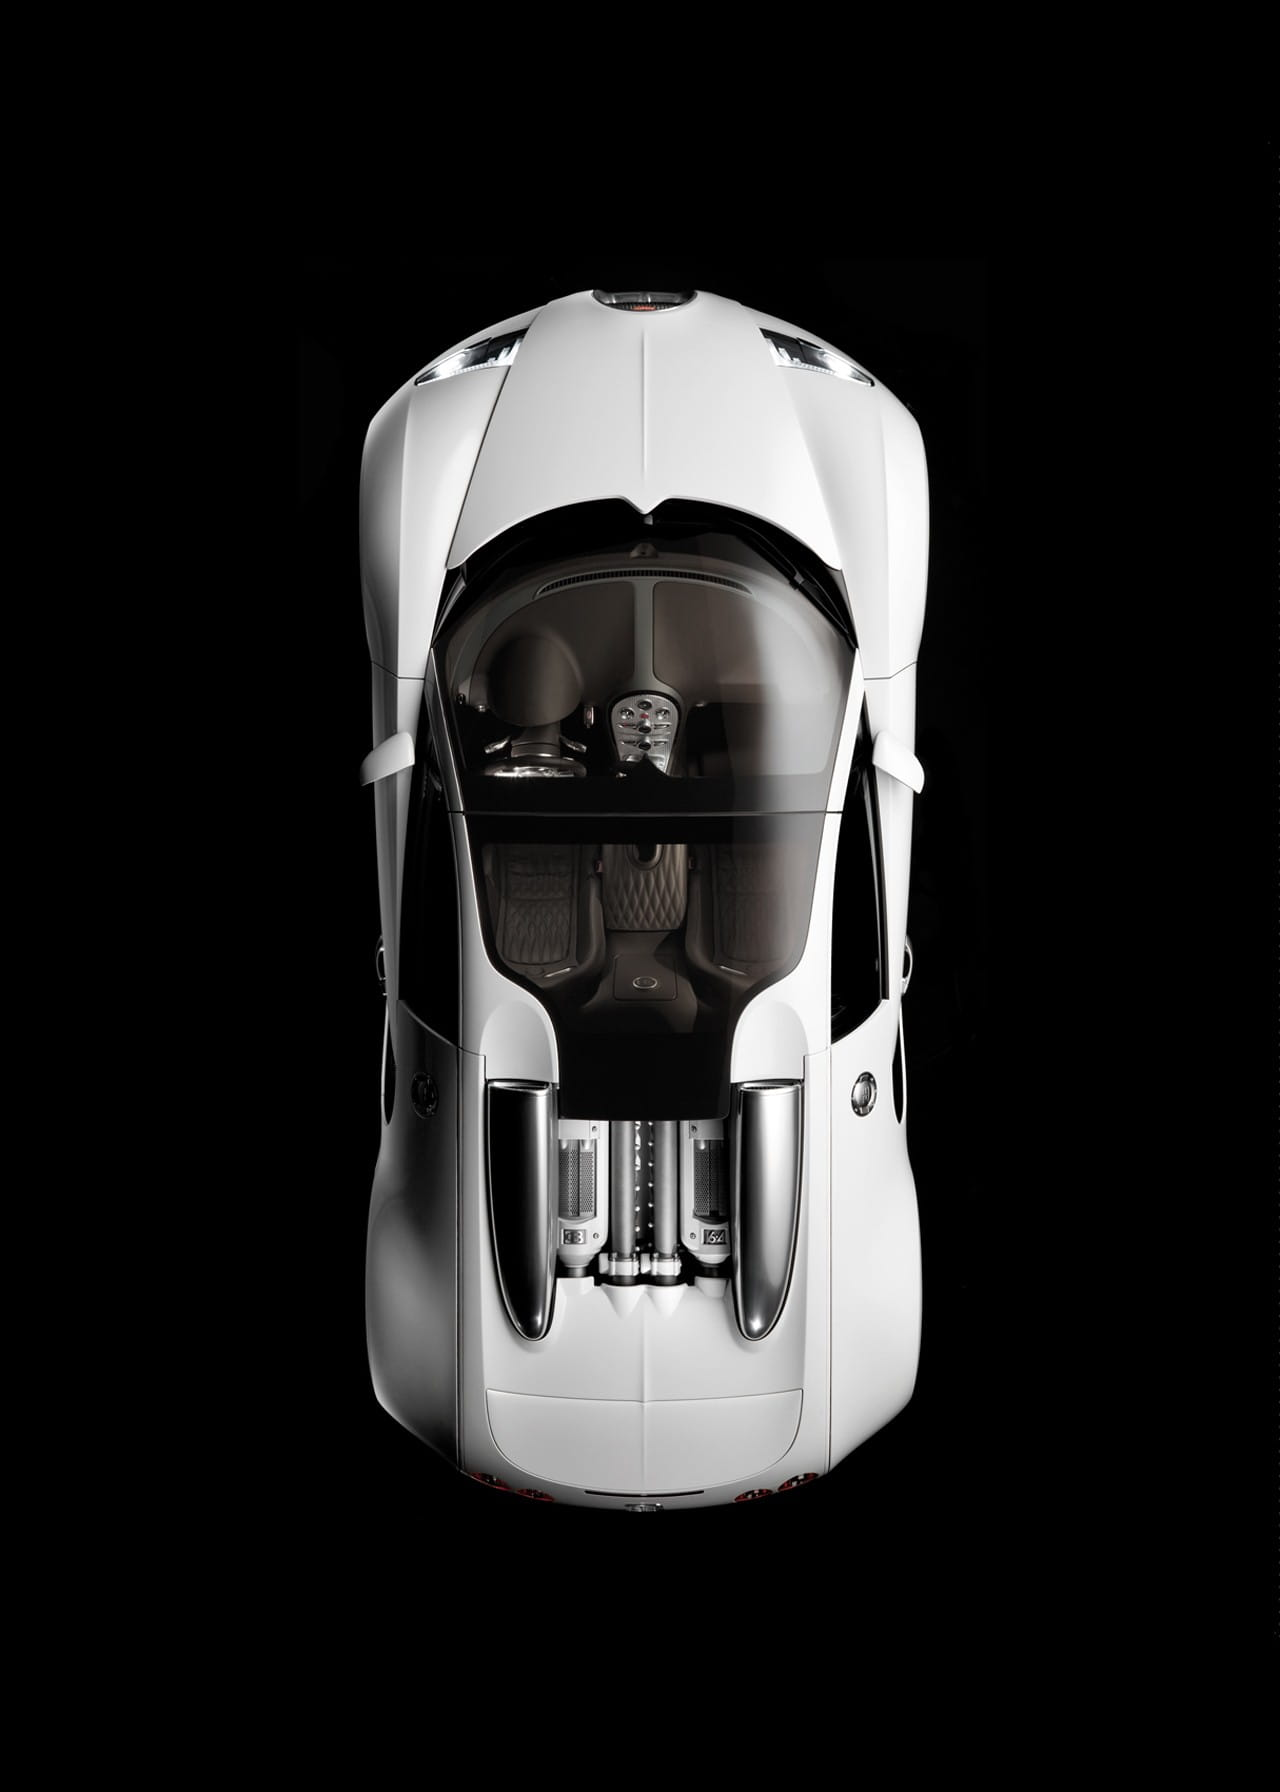 bugatti_veyron_grand_sport_12 Remarkable Bugatti Veyron Grand Sport Vitesse Informacion Cars Trend